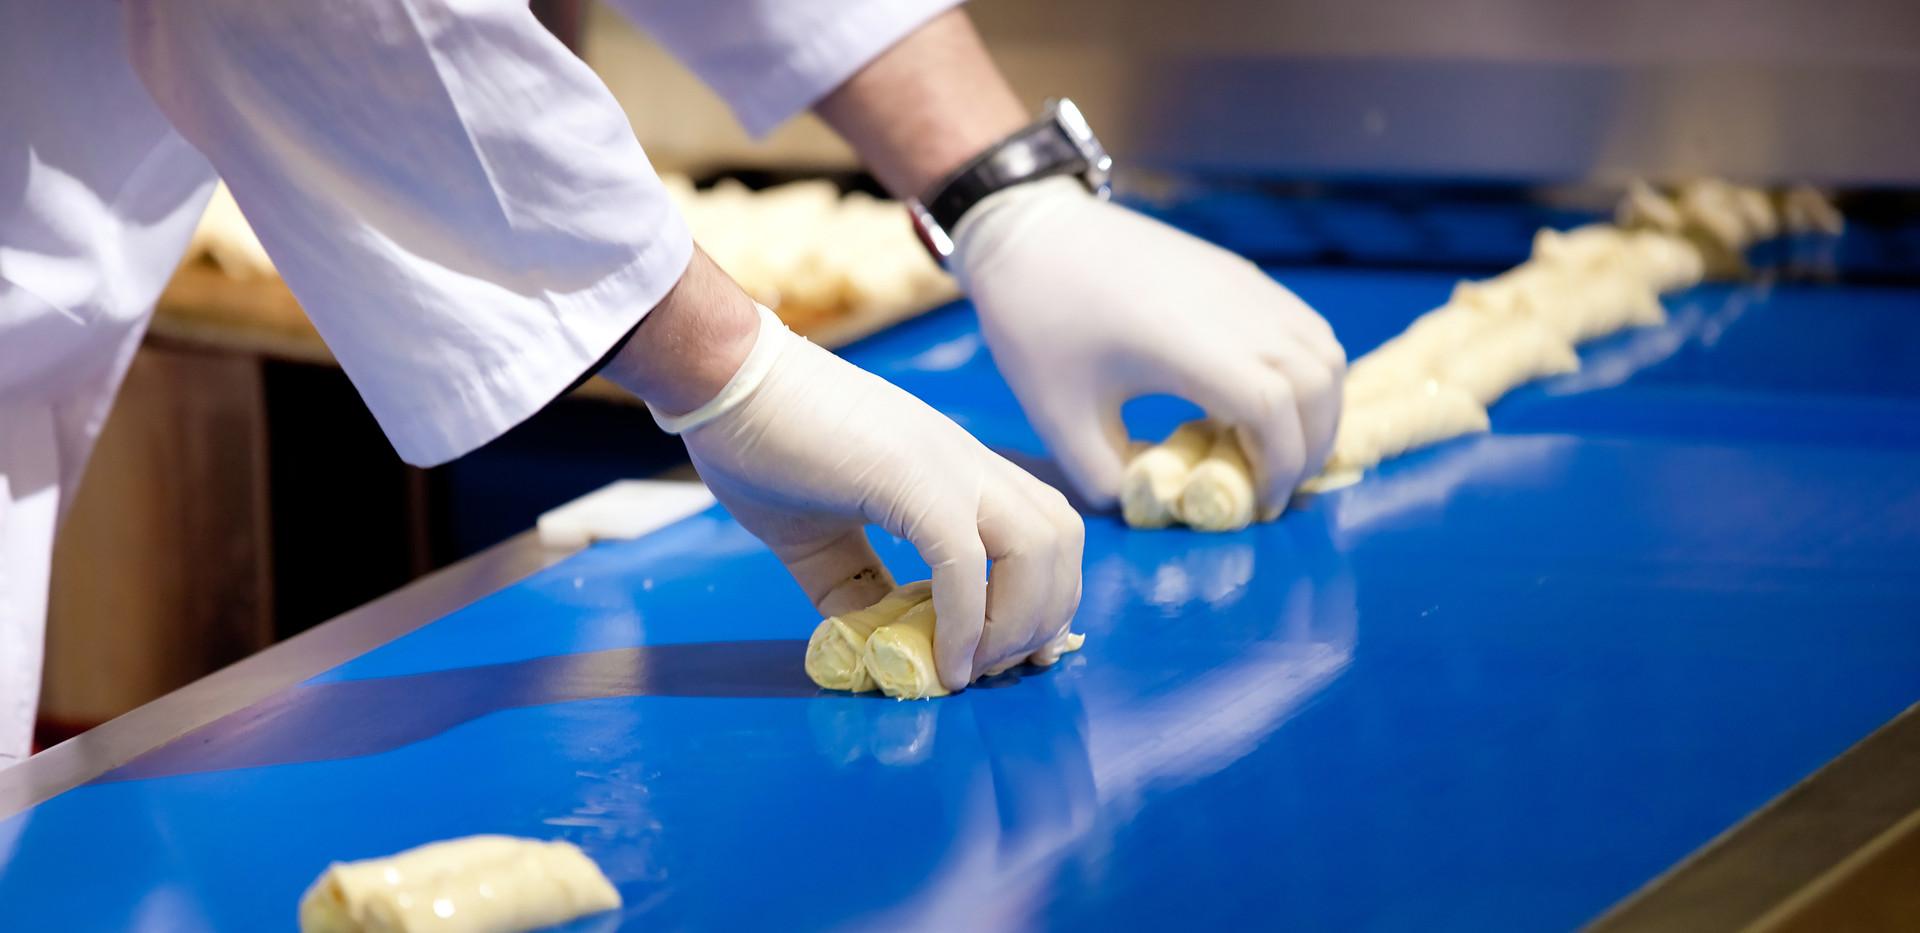 FDA Approved PU Conveyor Belt | R&D Supply Conveyor Belts